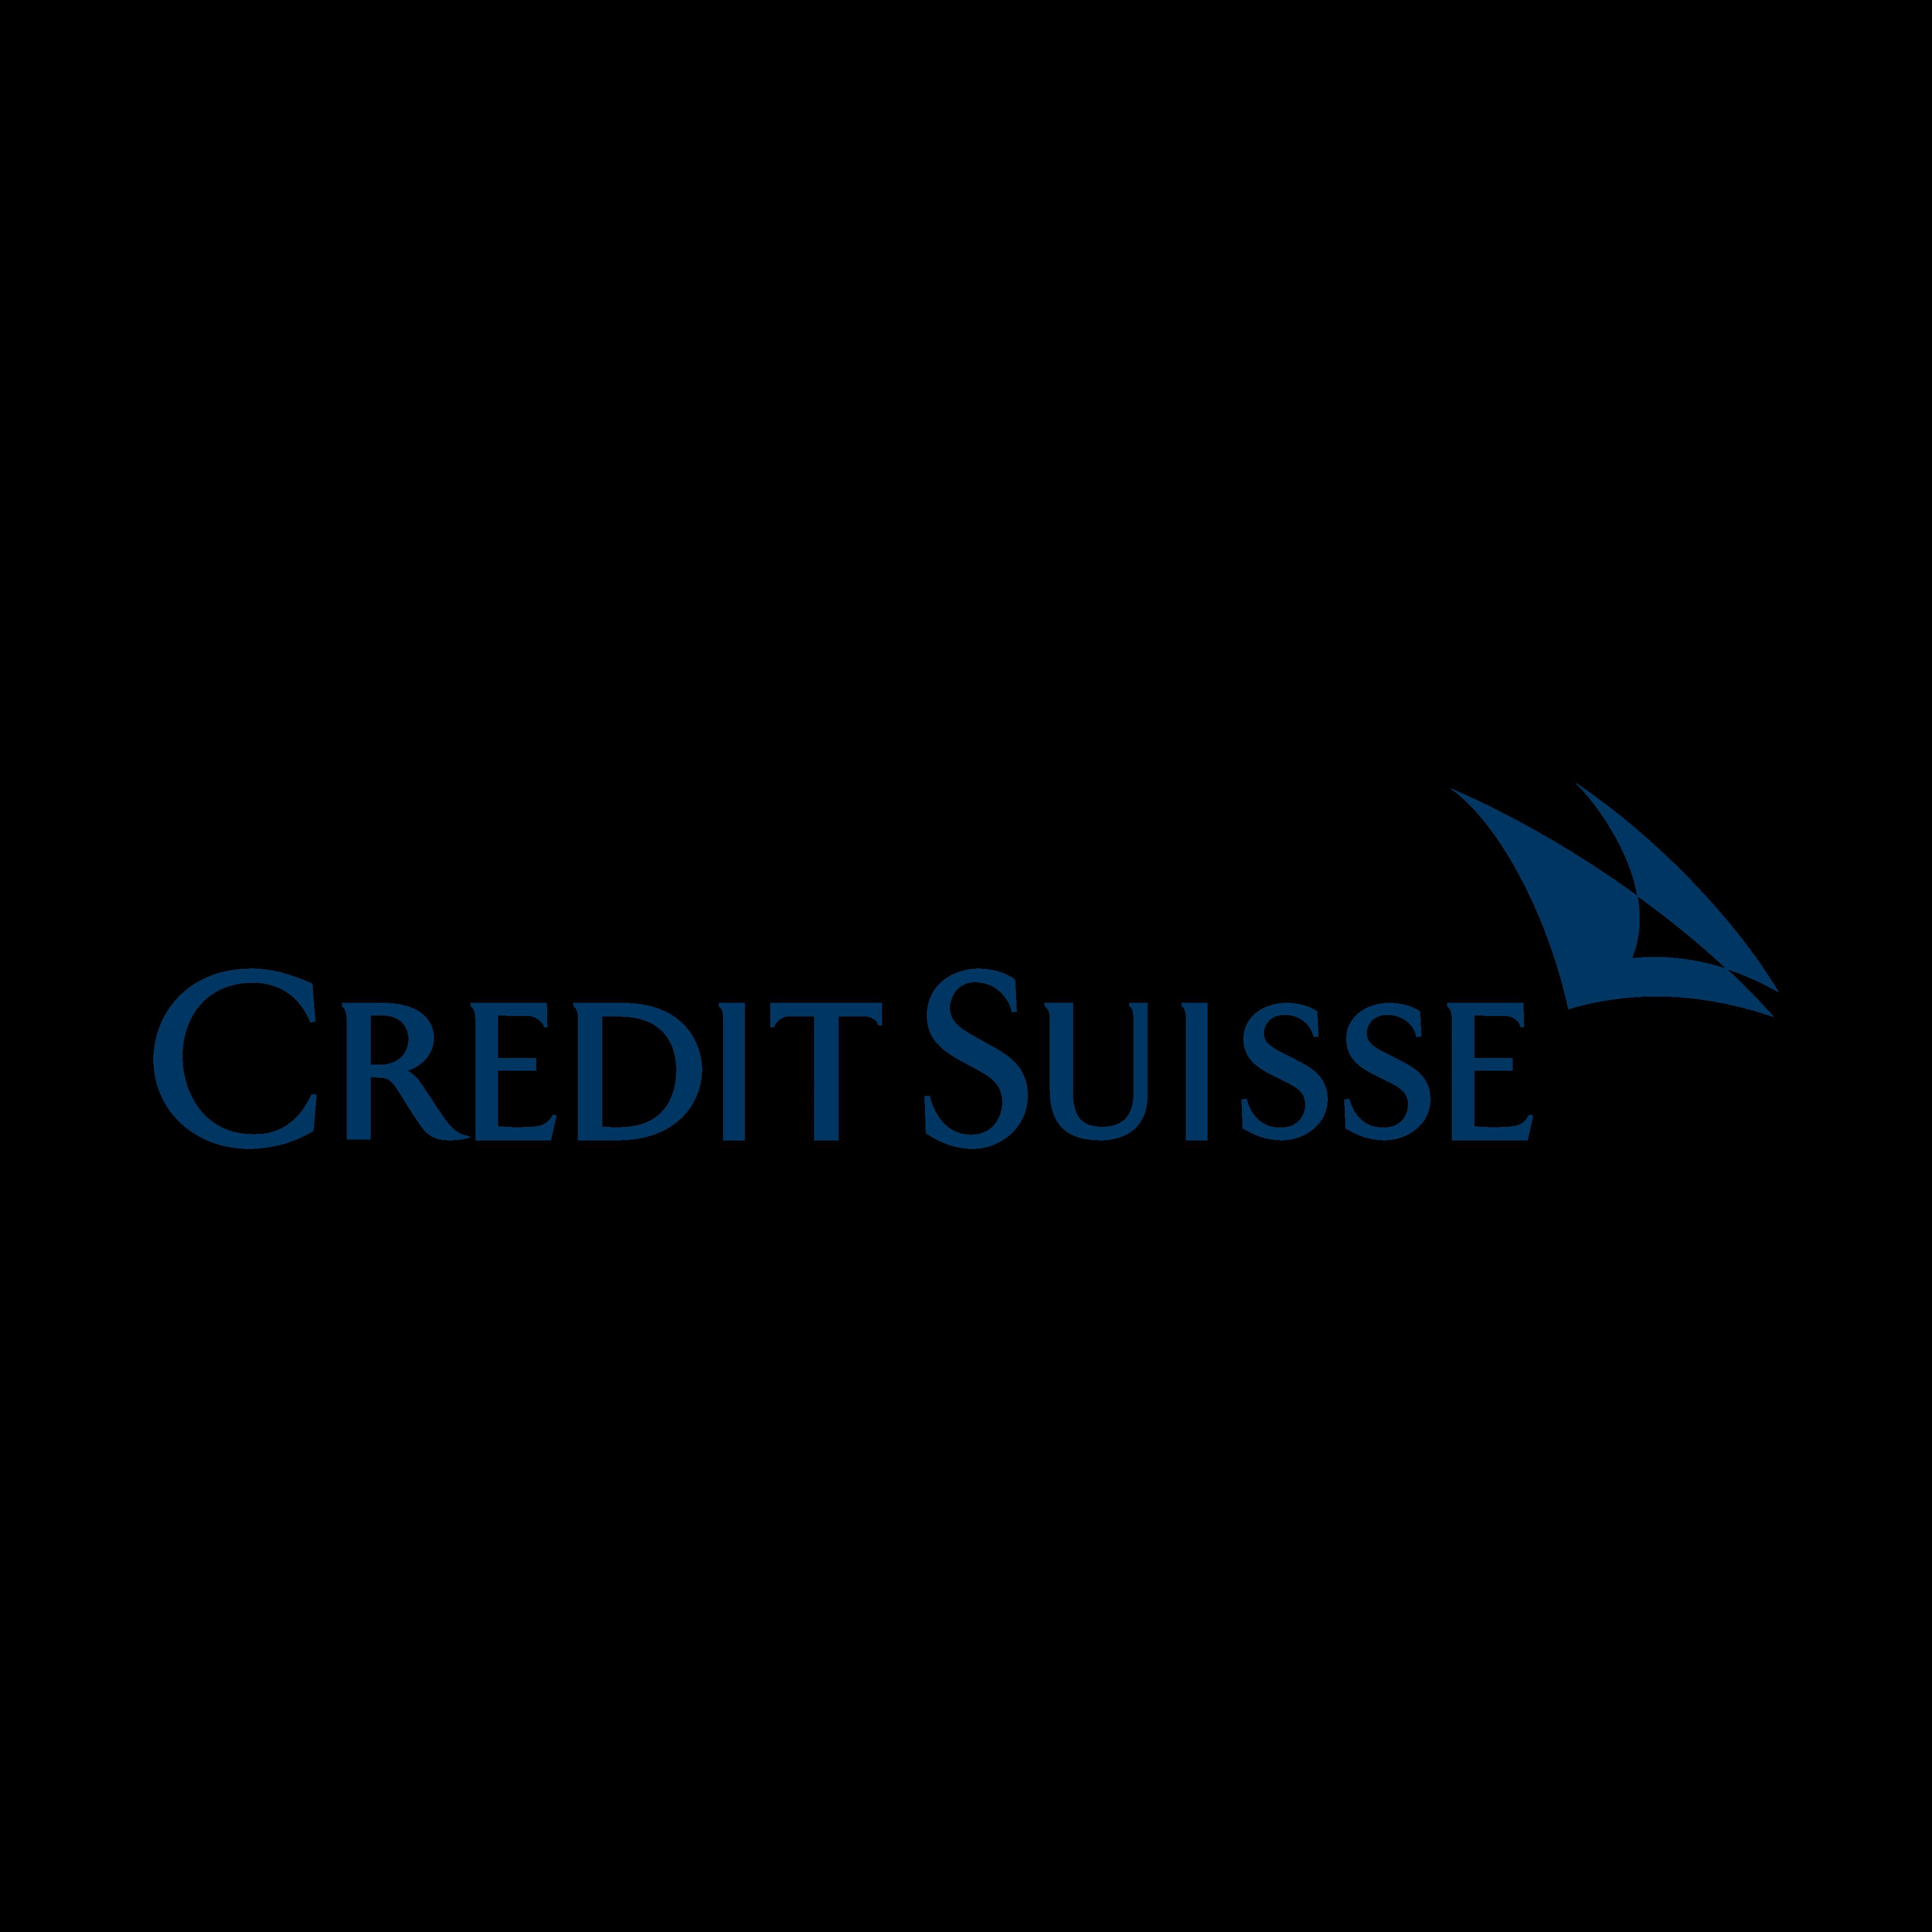 credt suisse logo 0 - Credit Suisse Logo